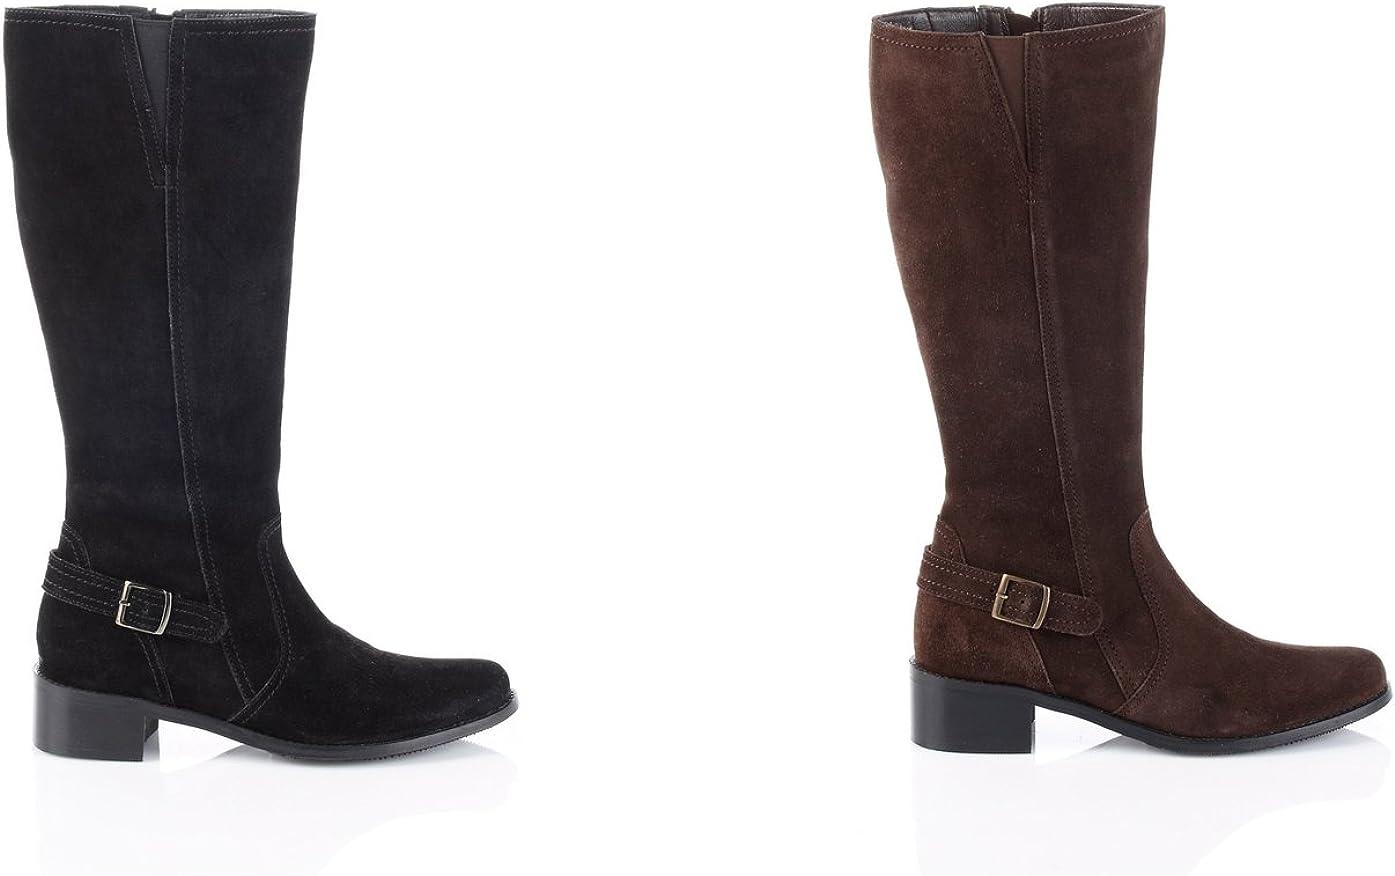 18 inch calf boots uk